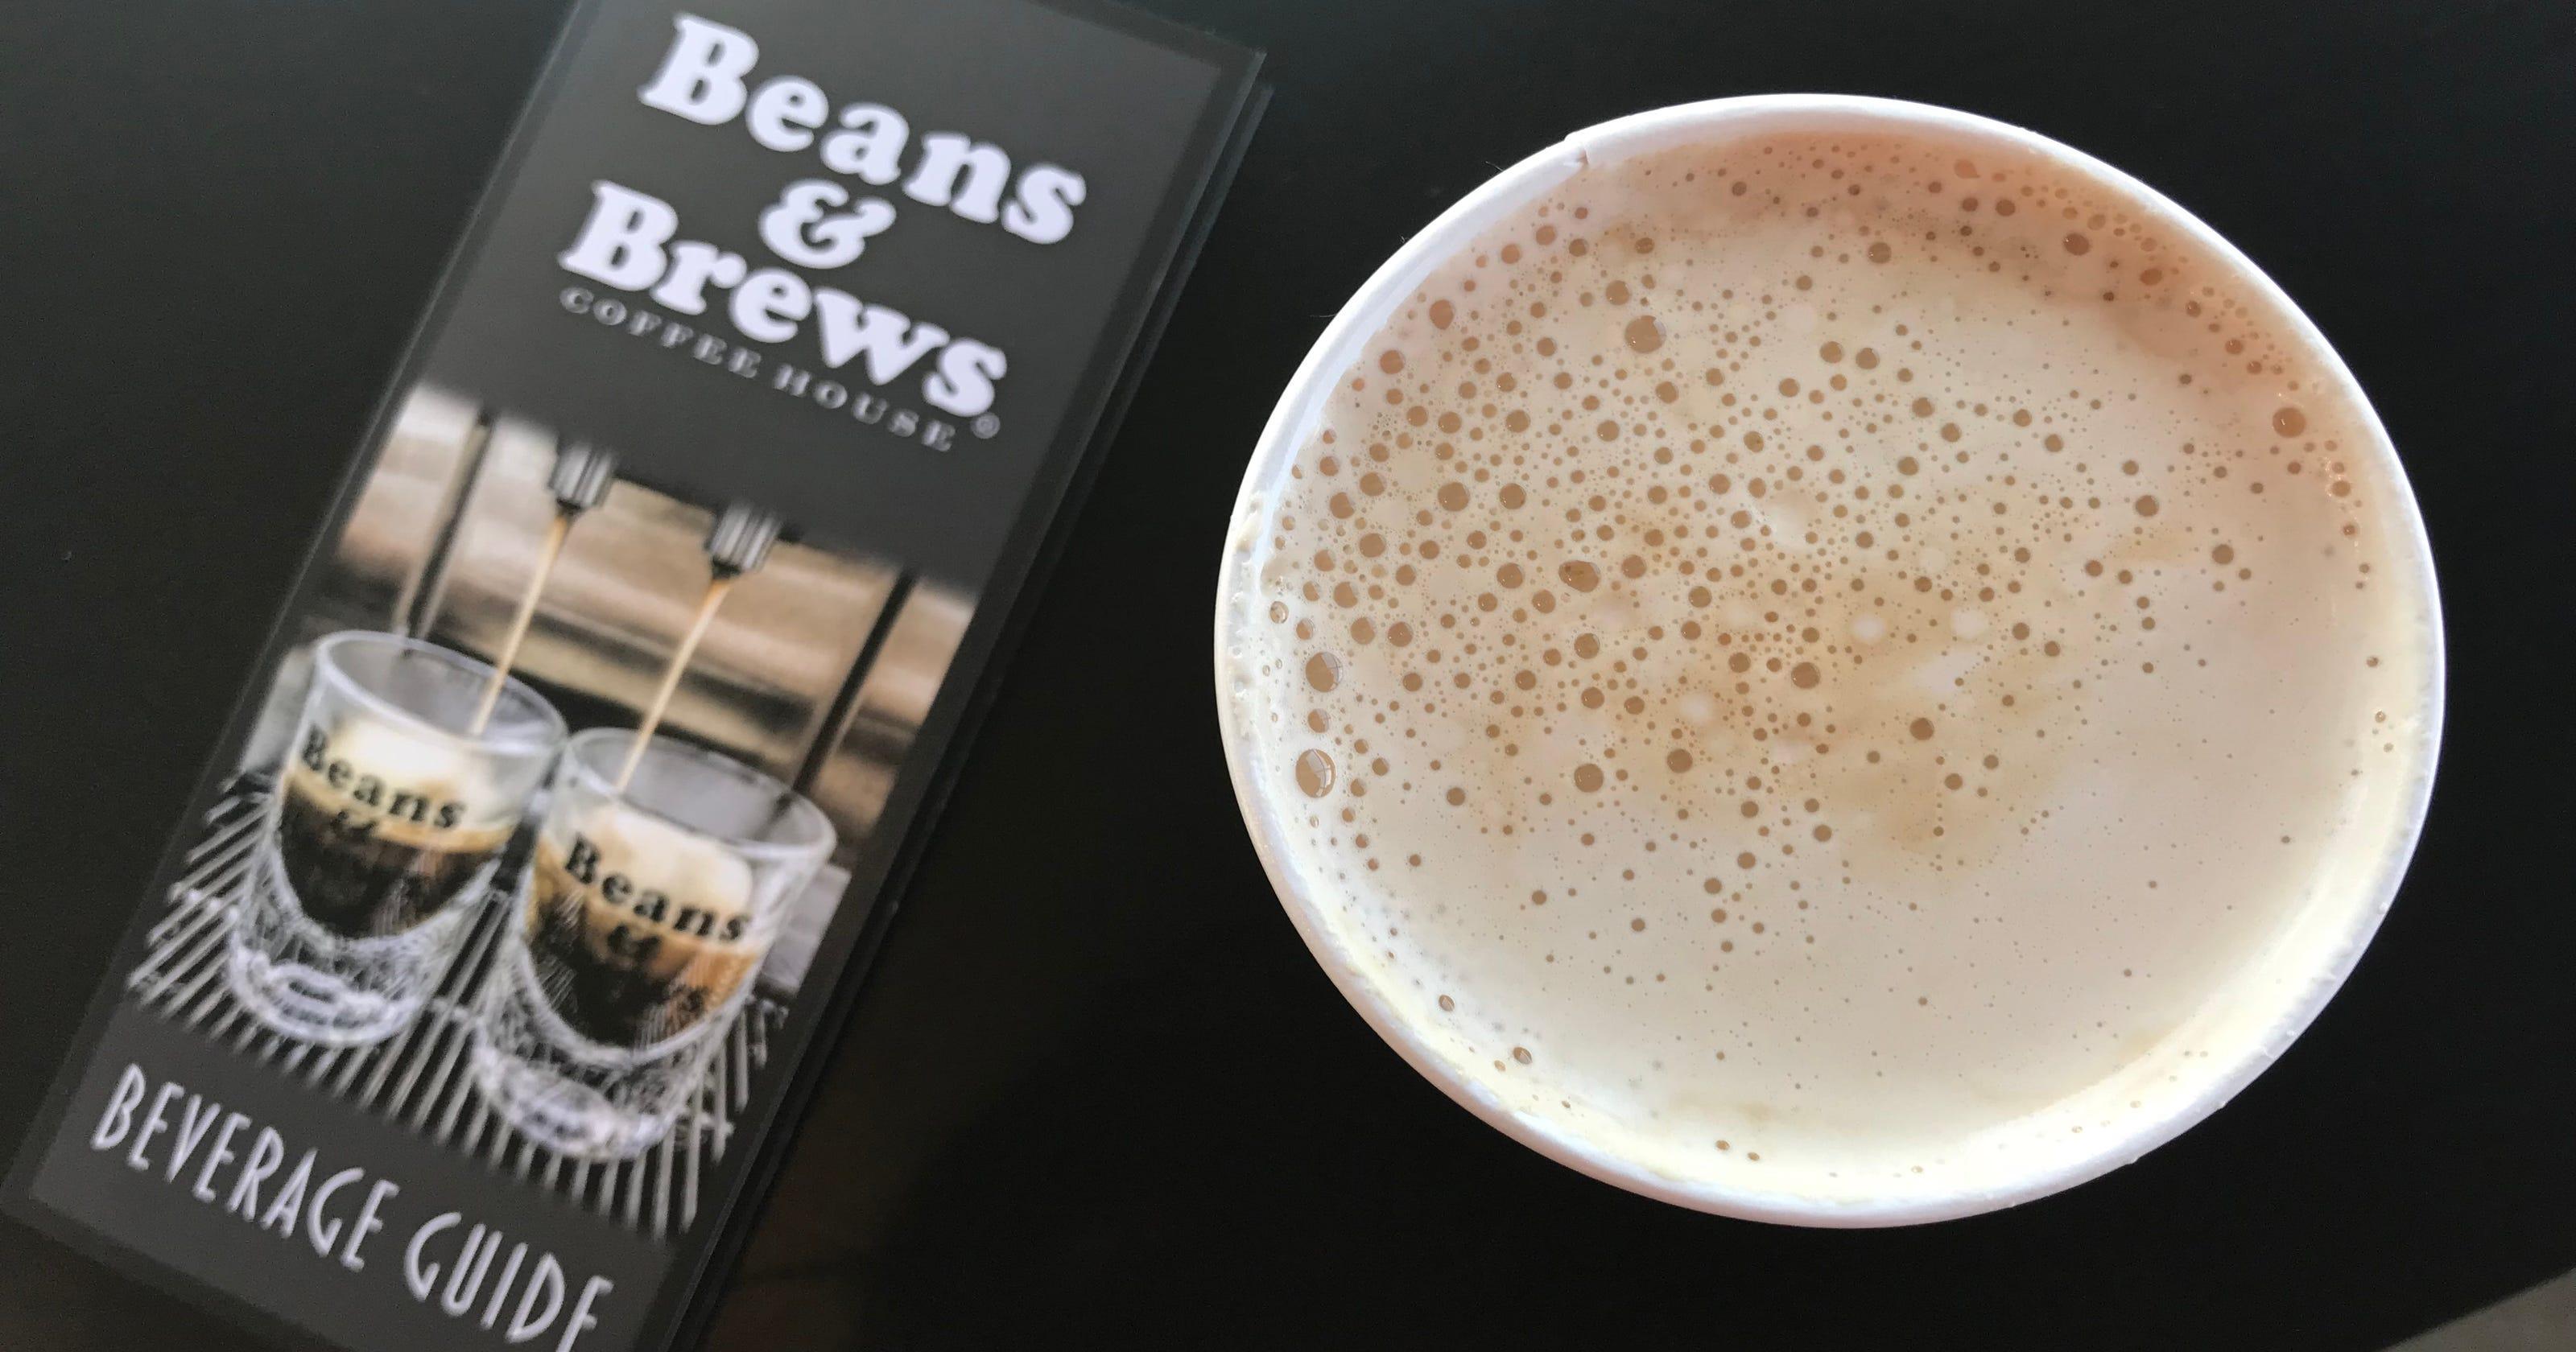 Beans Brews Decent Fast Food Coffee Chain